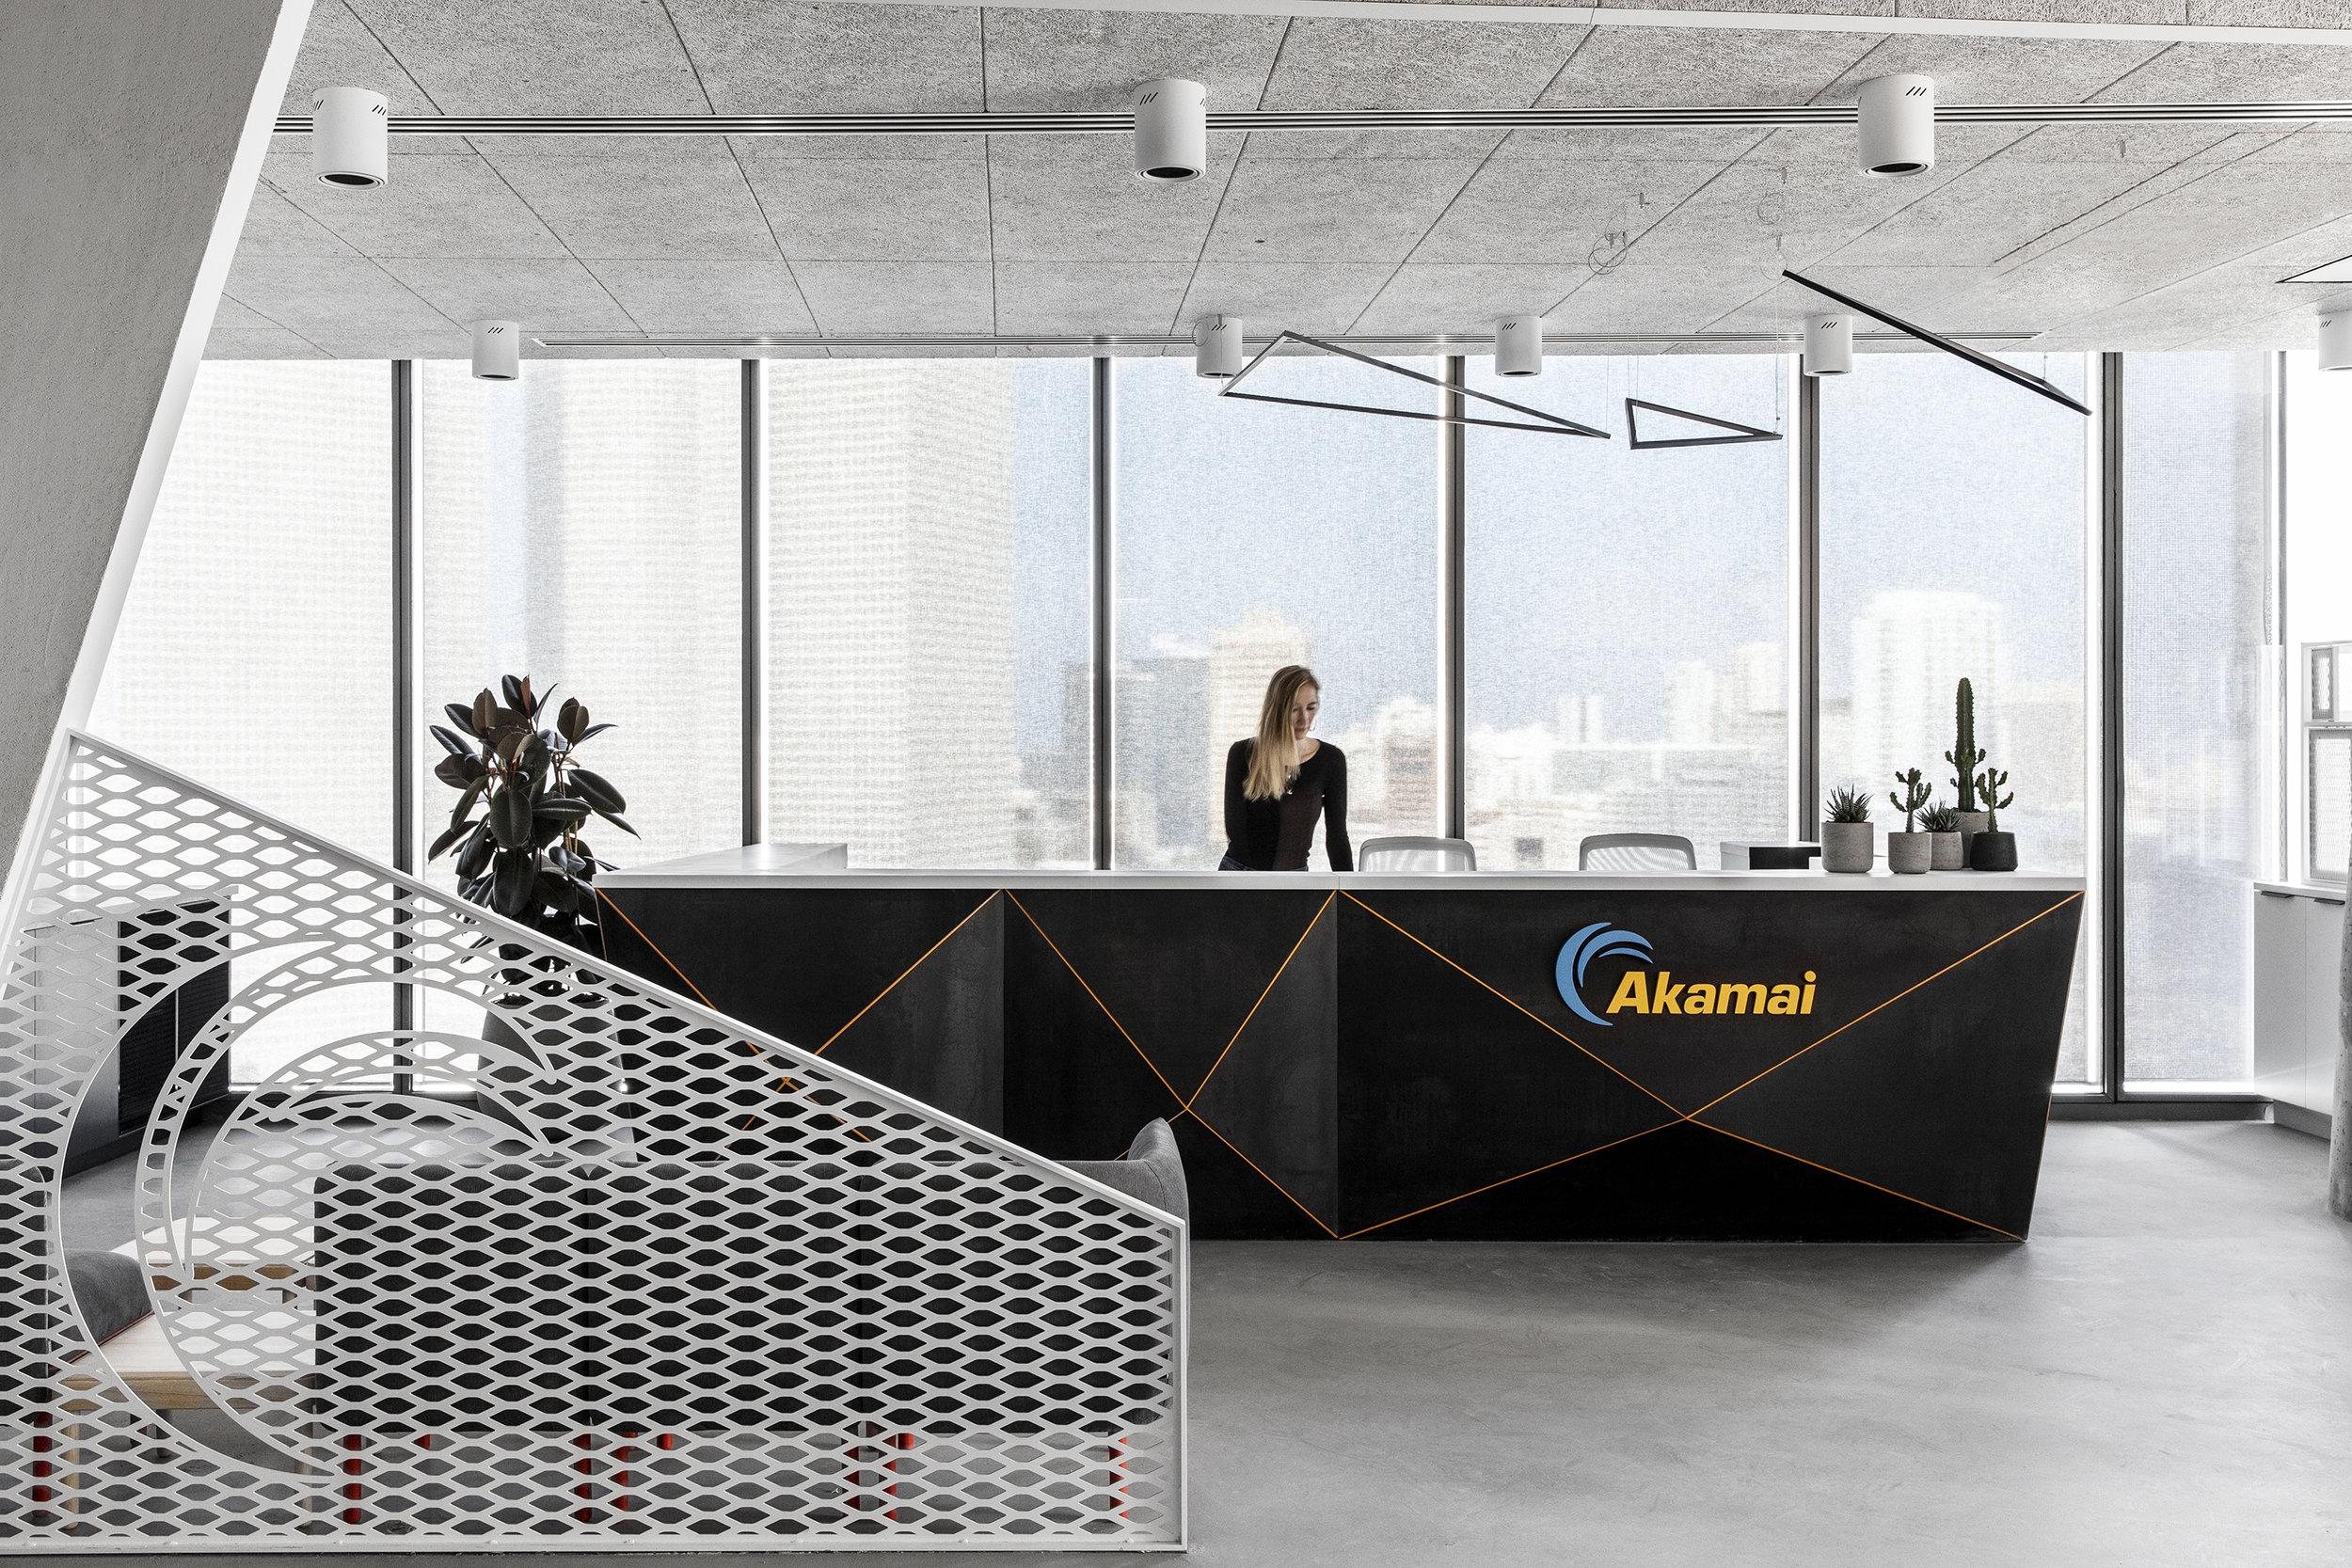 AKAMAI - ROY DAVID ARCHITECTURE - STUDIO - רואי דוד אדריכלות - אדריכלים - סטודיו - אקמאי (2).jpg